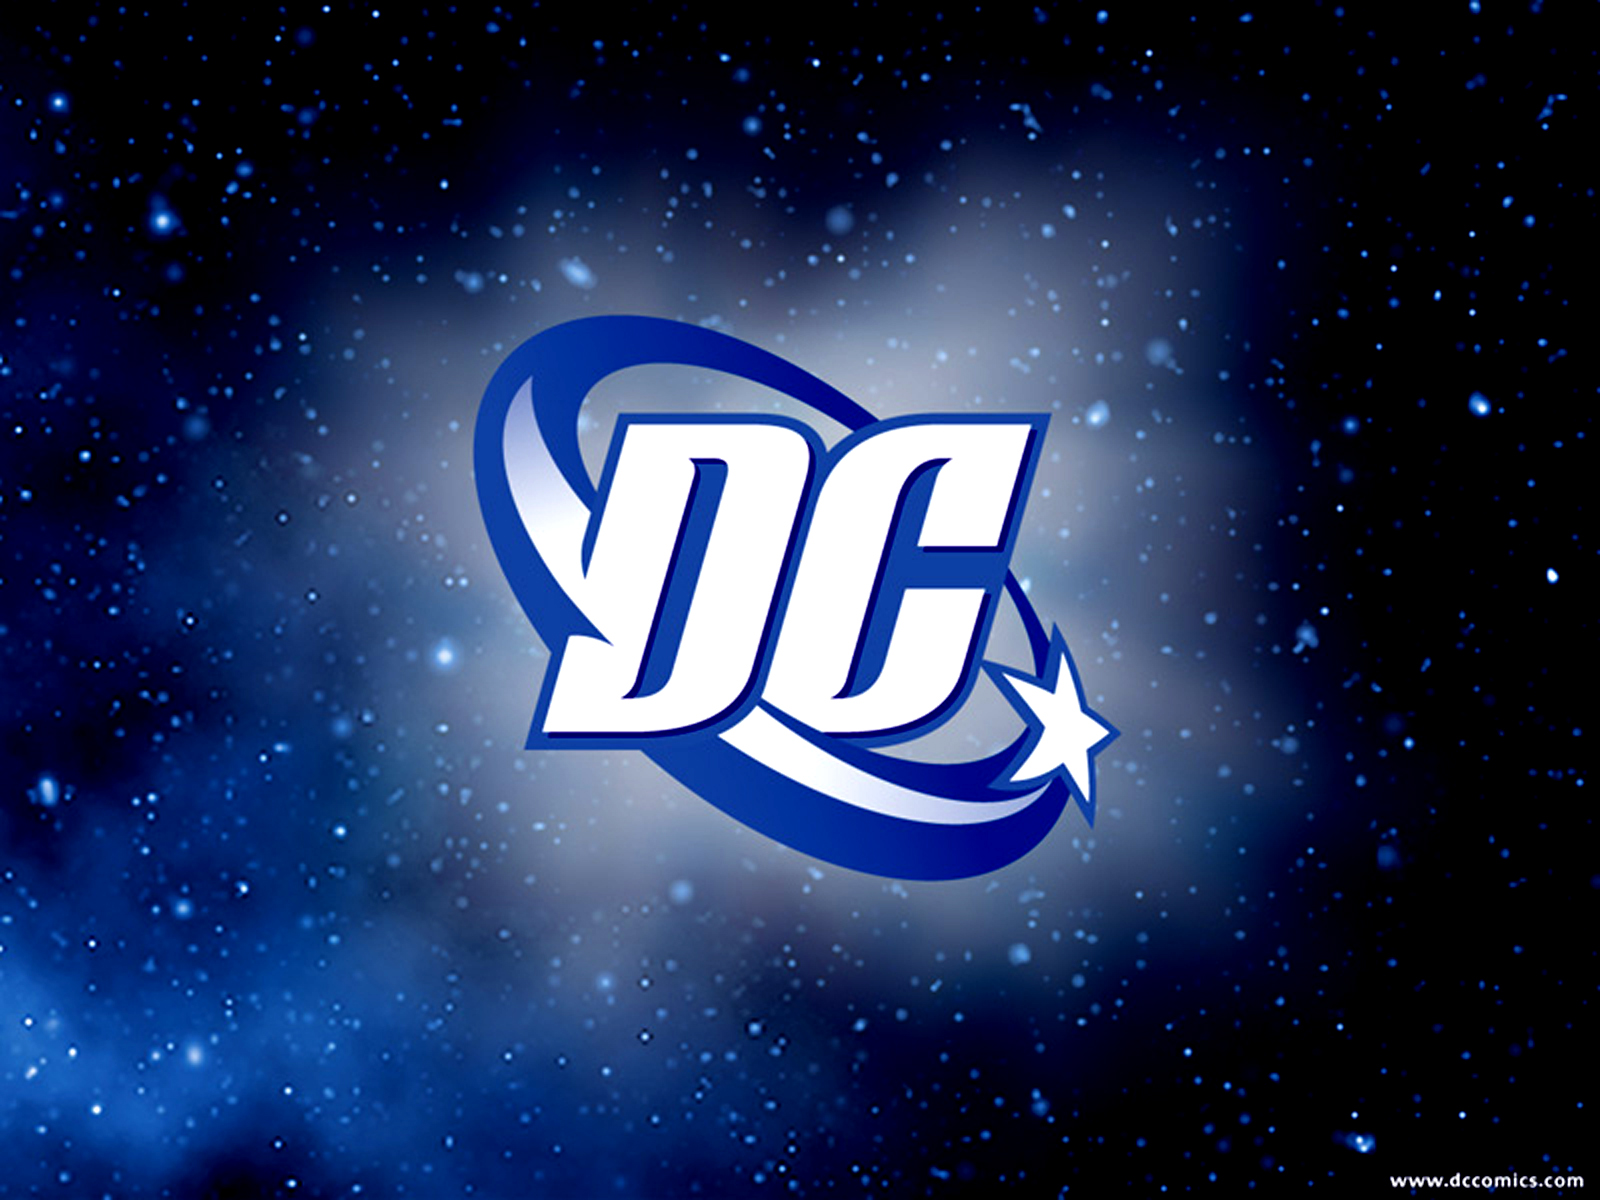 DC Comics All Characters HD Desktop Wallpapers Cartoon Wallpapers 1600x1200